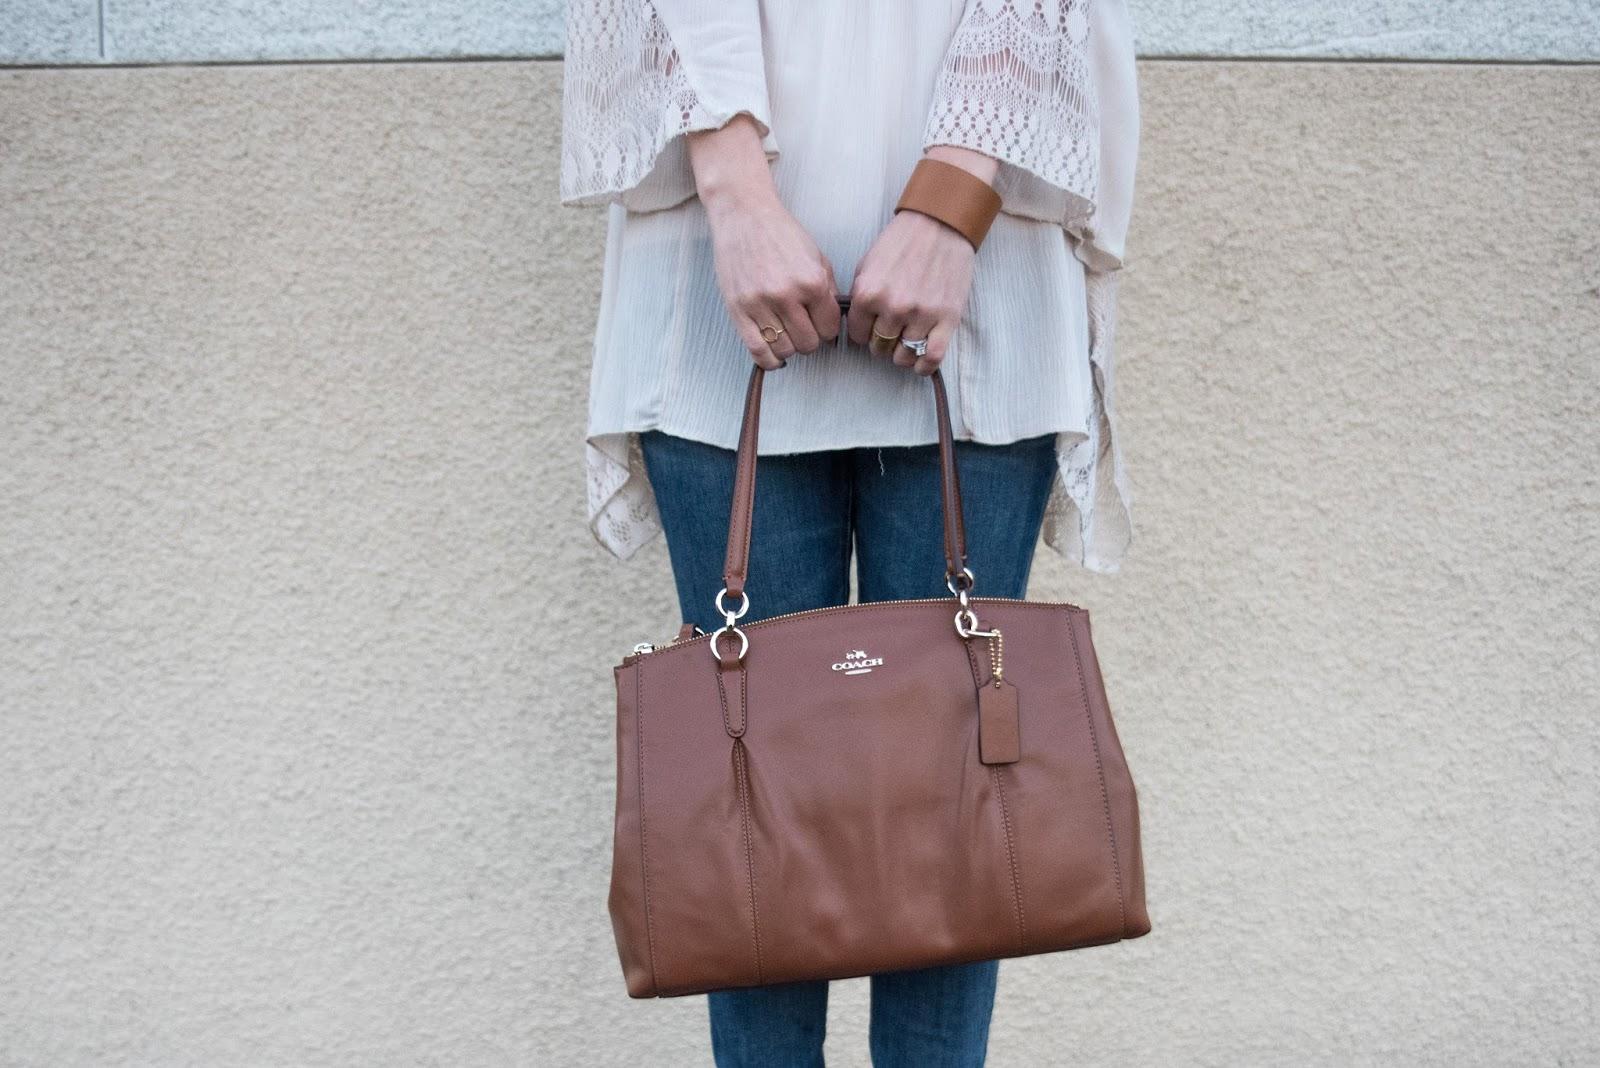 coach leather handbags outlet omv4  Shopping At Traverse Mountain Outlets O Fab Blog Coach Latest Handbags